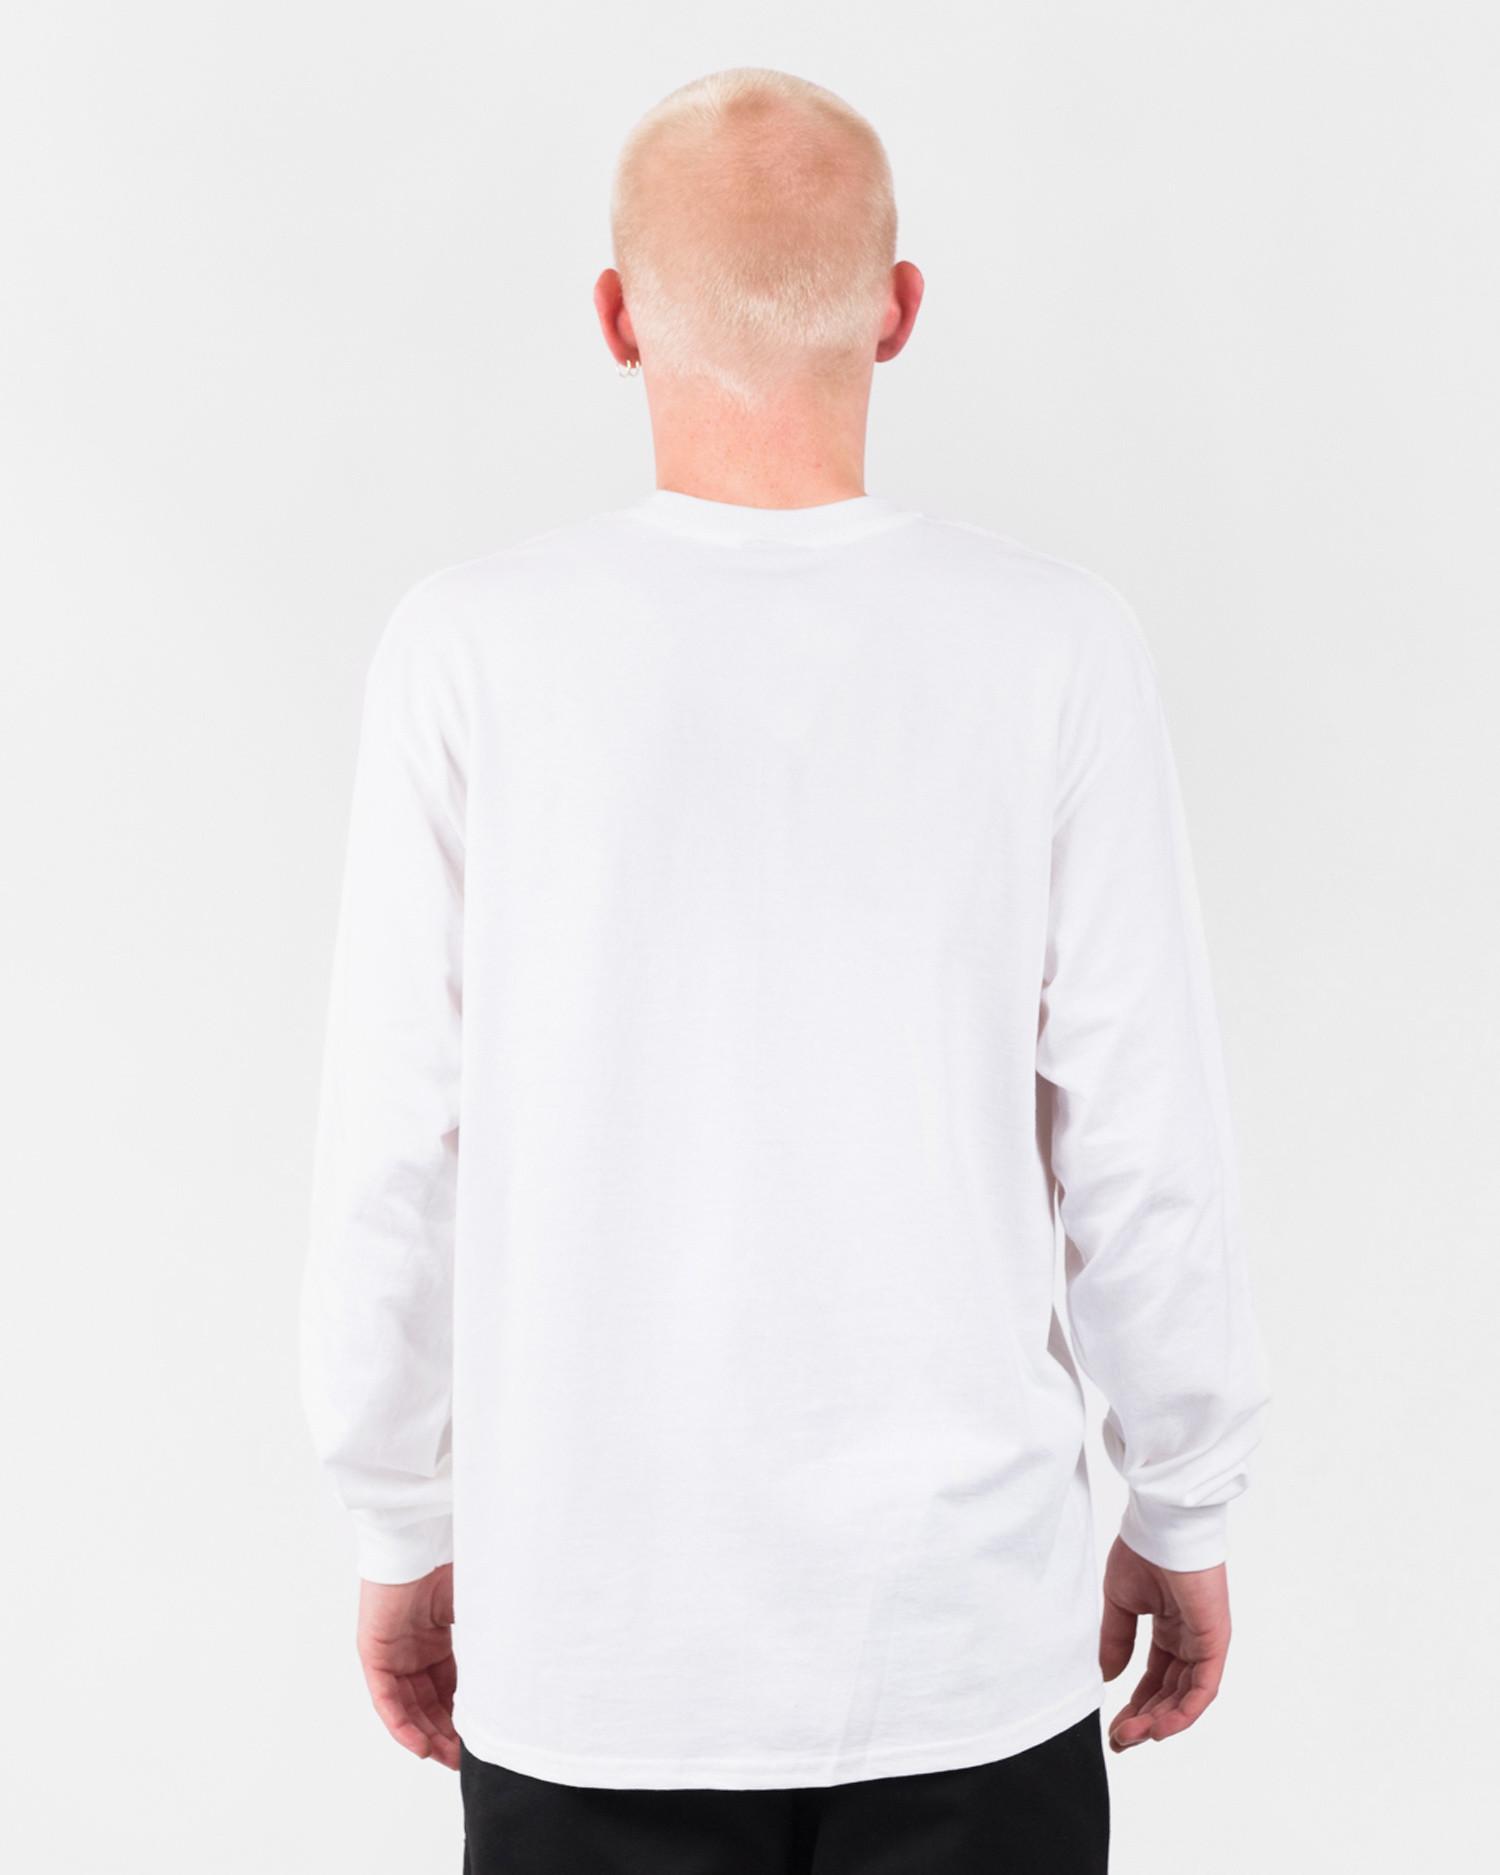 Hockey Nik Stain Longsleeve T-Shirt White